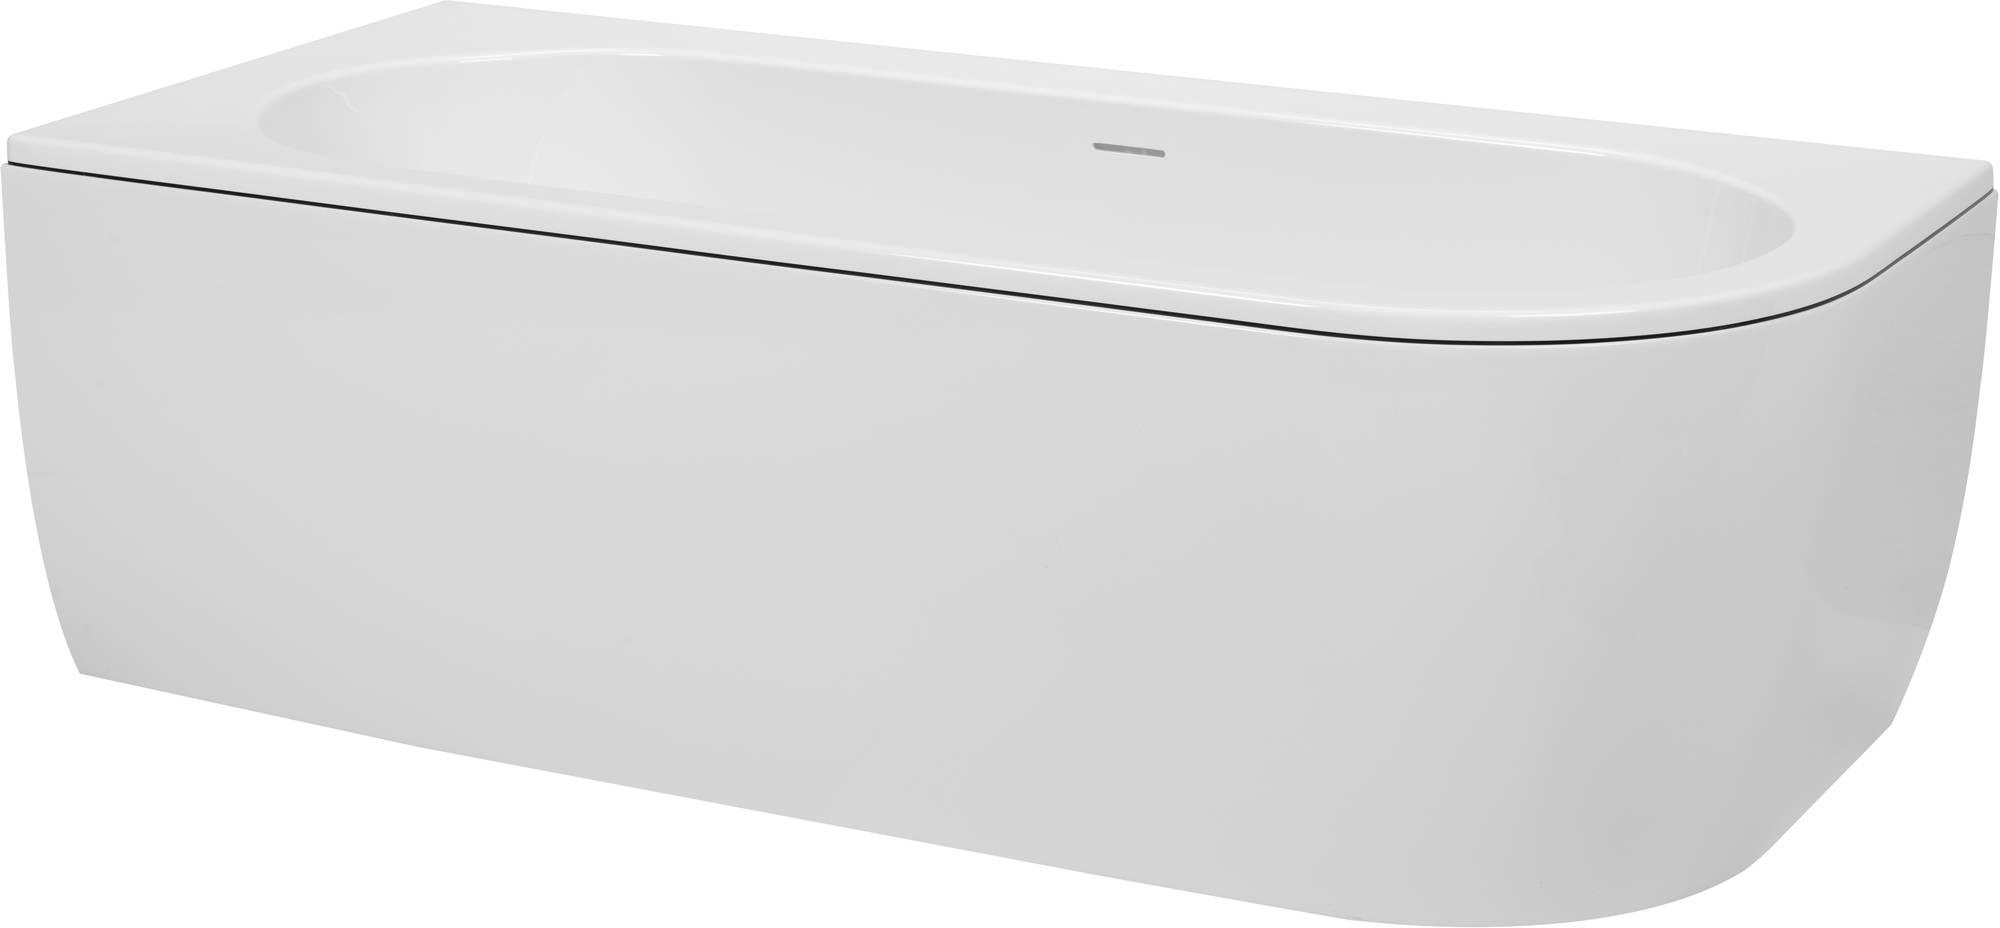 Saniselect Hilla Bad Back-to-Wall L met zwarte rand en witte waste cover 180x80x60 cm Wit